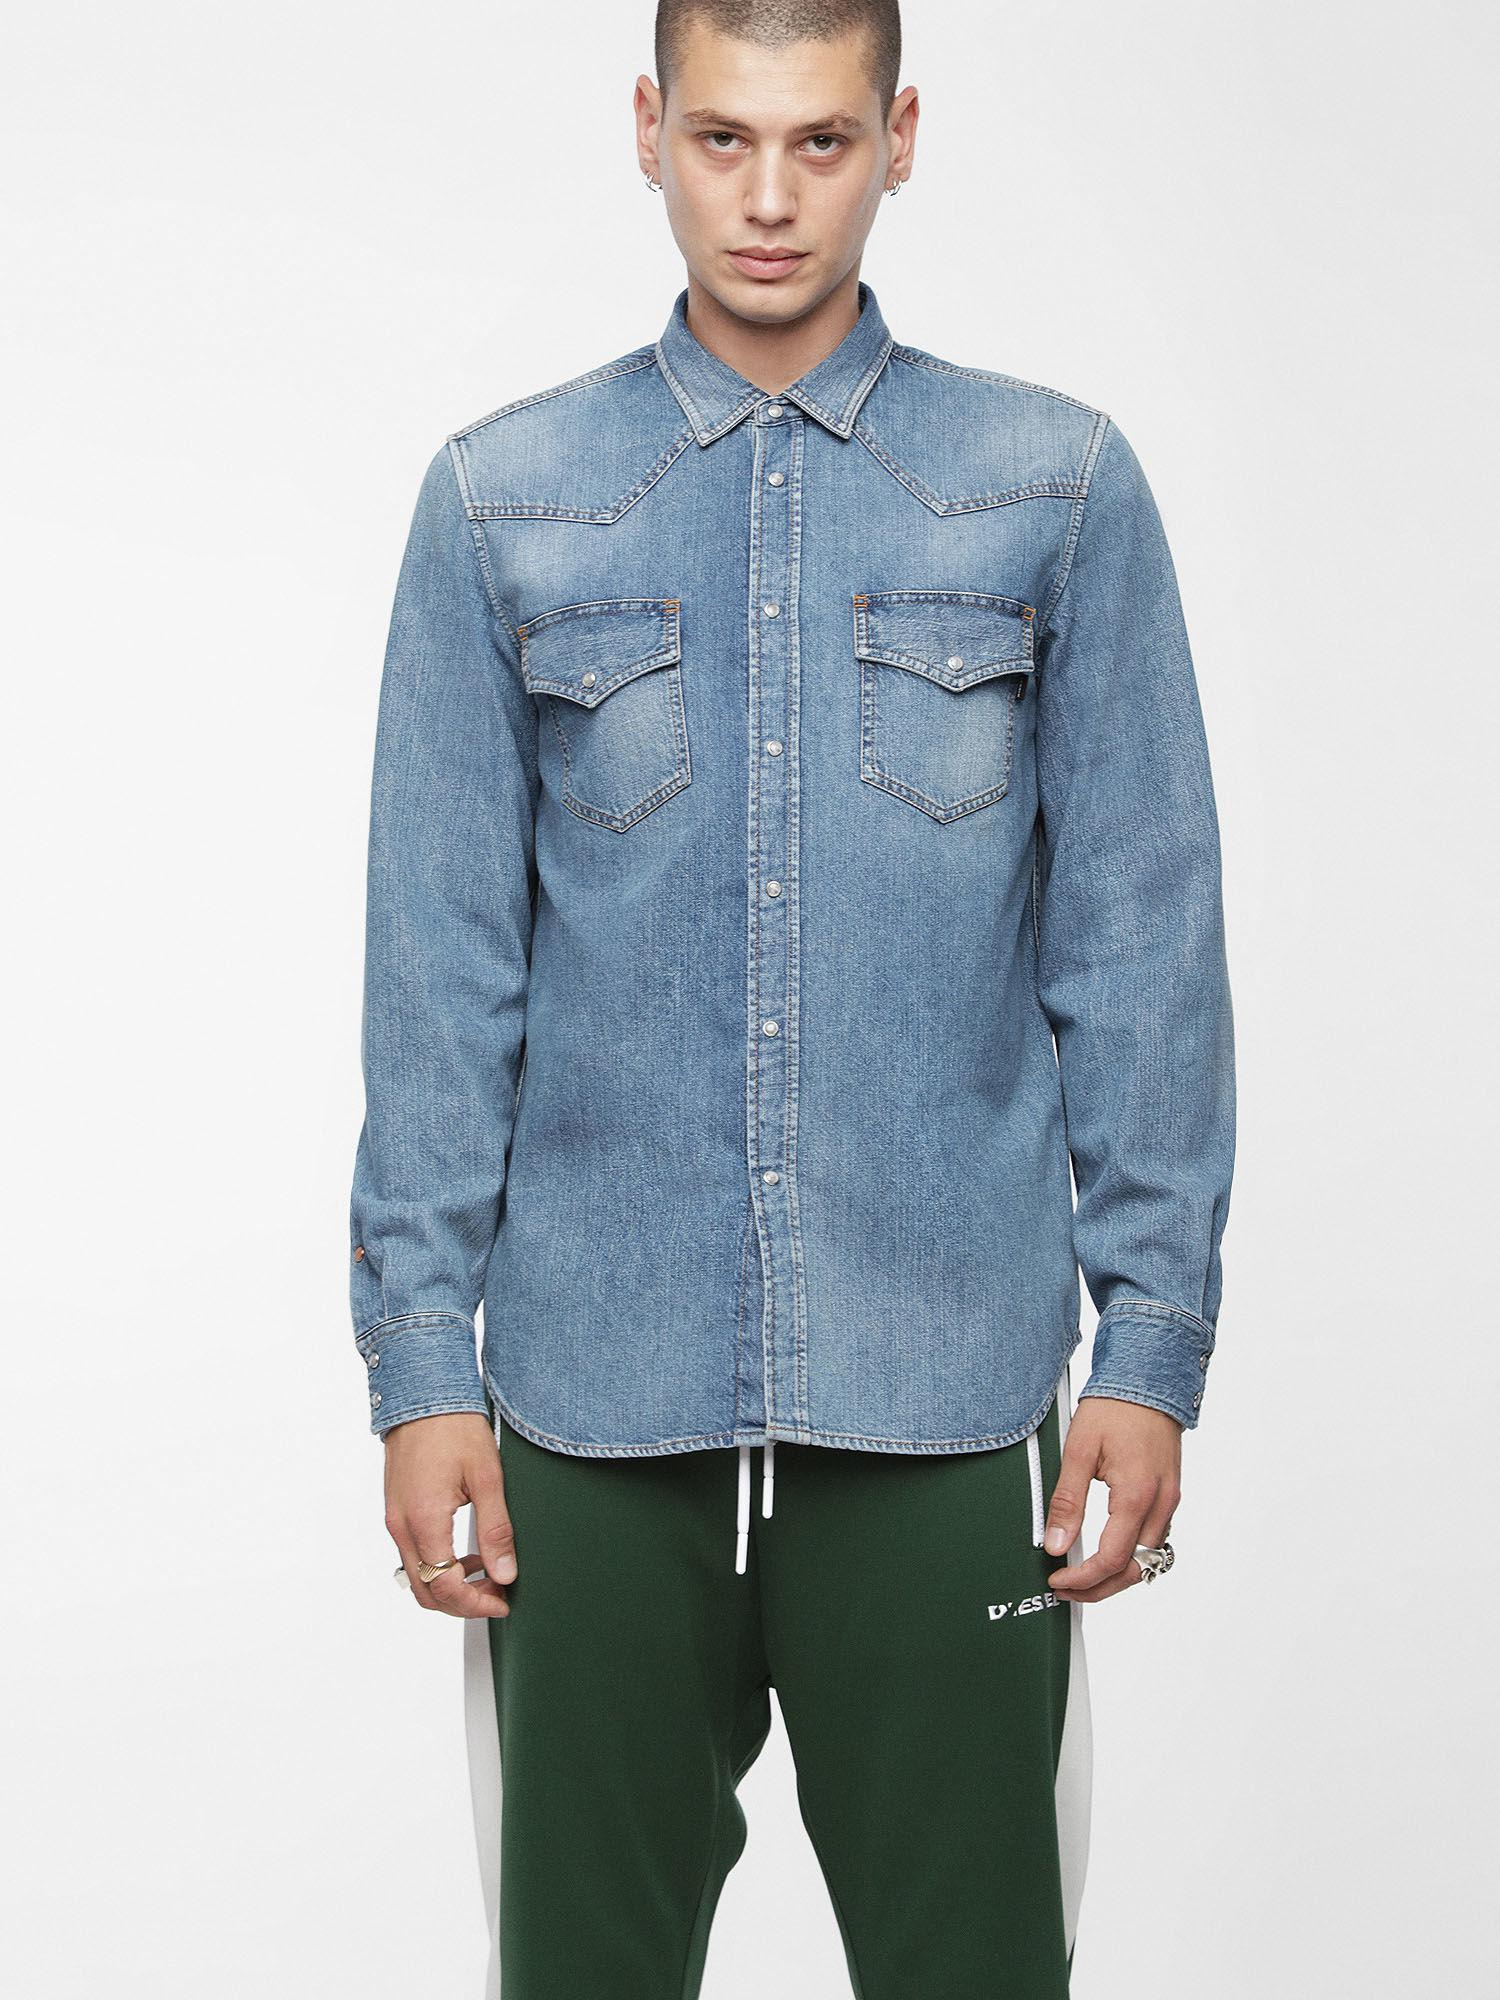 431a6e183a DIESEL - Blue Denim Shirt With Vintage Wash for Men - Lyst. View fullscreen